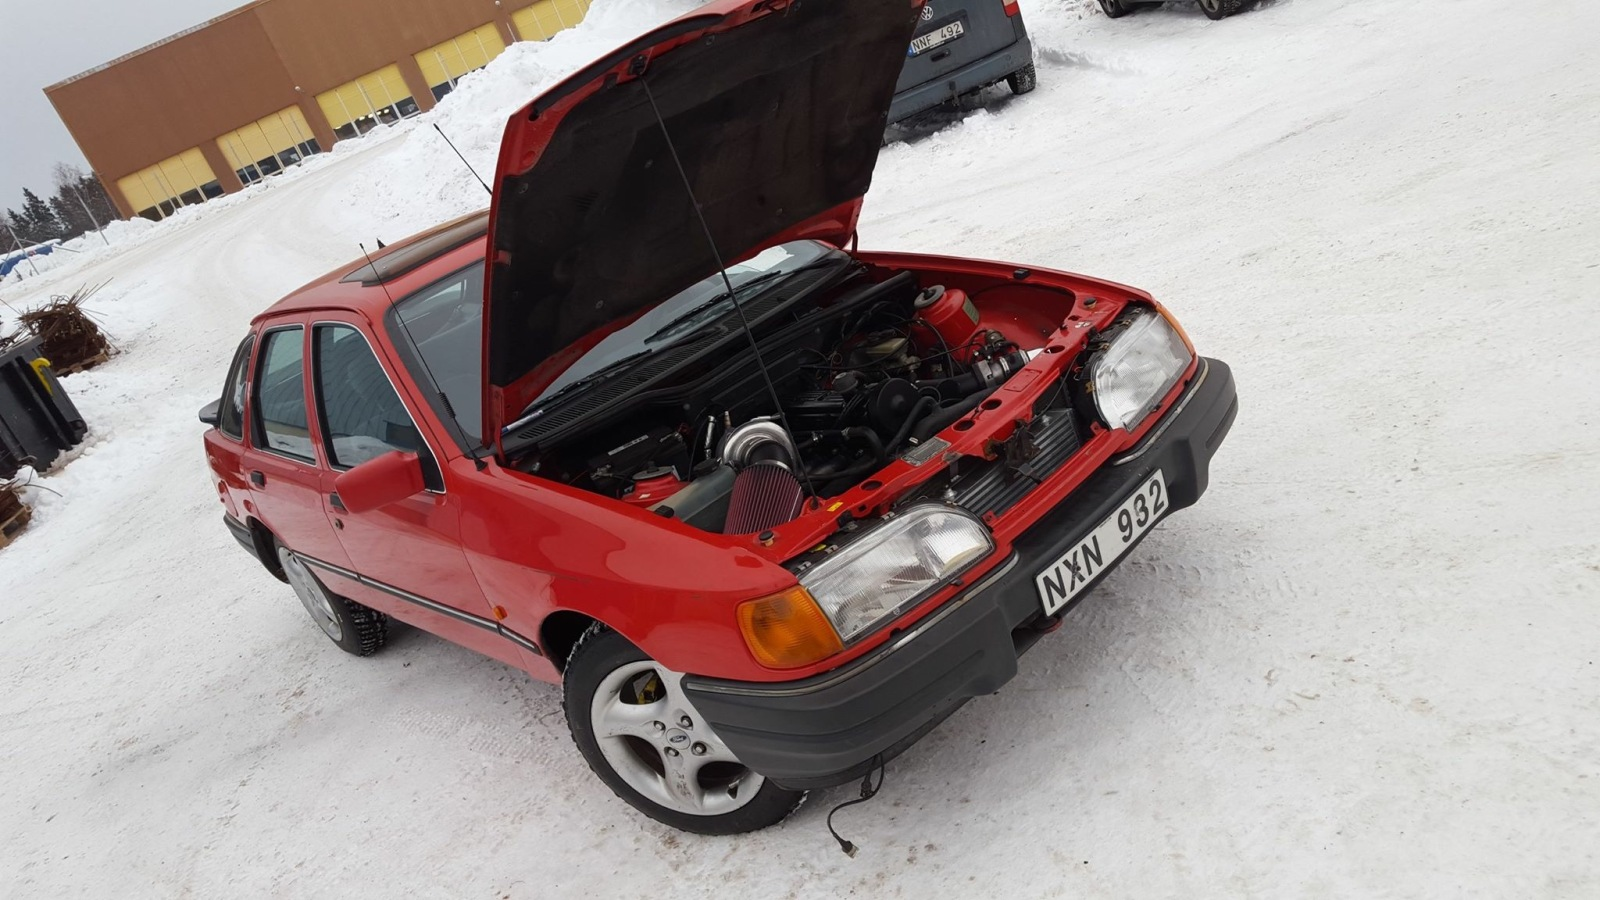 Håcke - Ford Capri Turbo Bromsad 502,2whp 669,9wnm - Sida 16 2hyf988